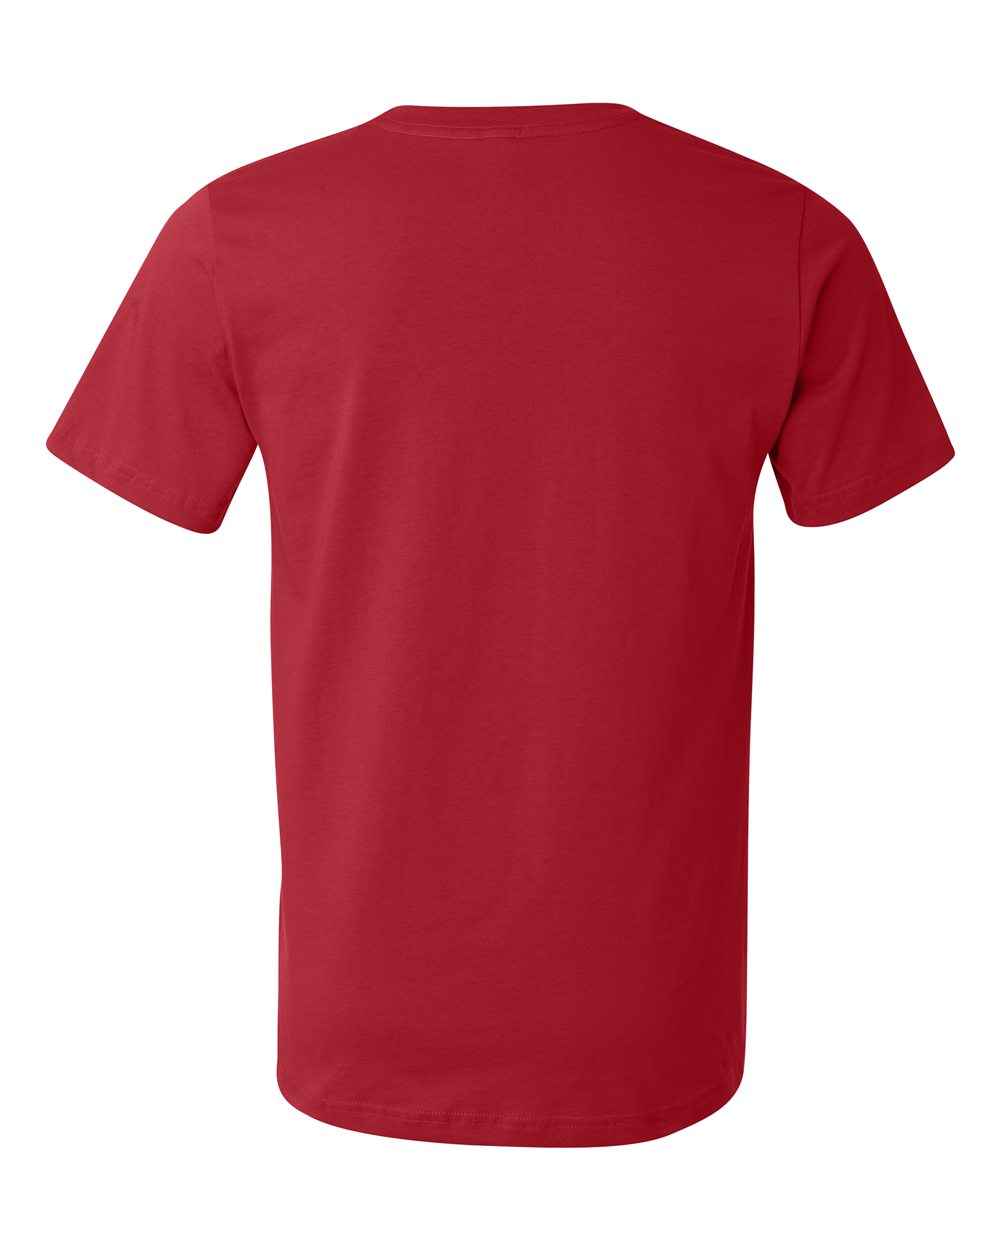 Bella-Canvas-Unisex-Made-in-USA-Jersey-Short-Sleeve-T-Shirt-3001U-XS-3XL thumbnail 22